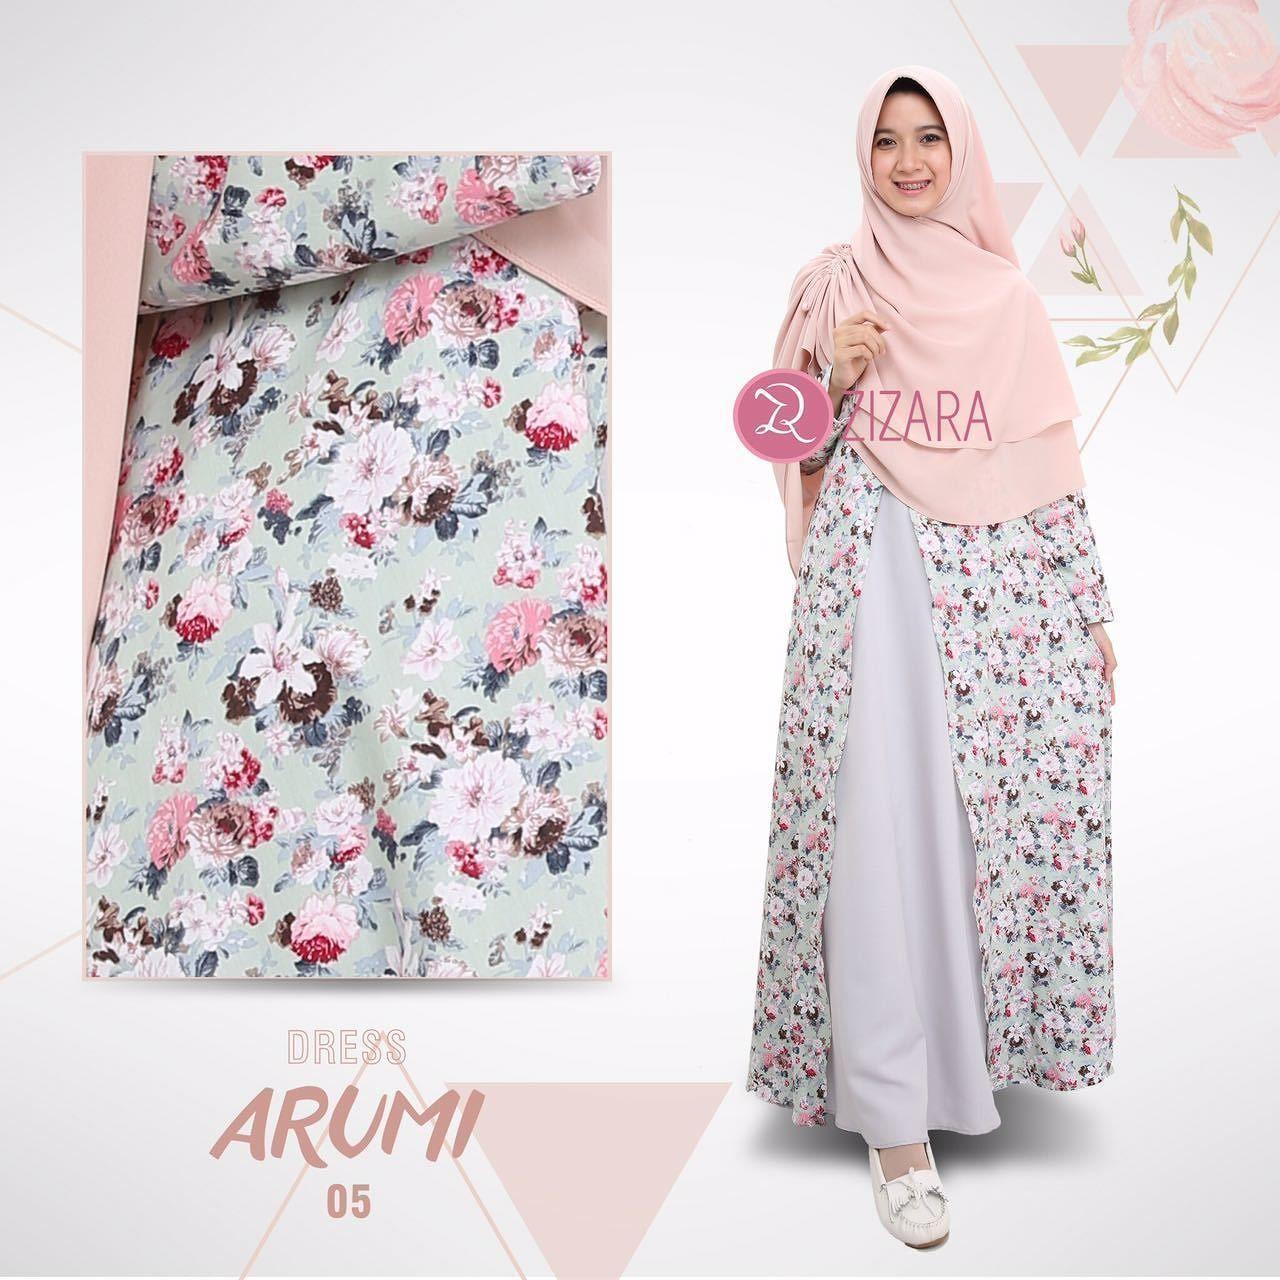 Gamis Zizara Arumi Dress 12 - baju muslimah busana muslim Kini